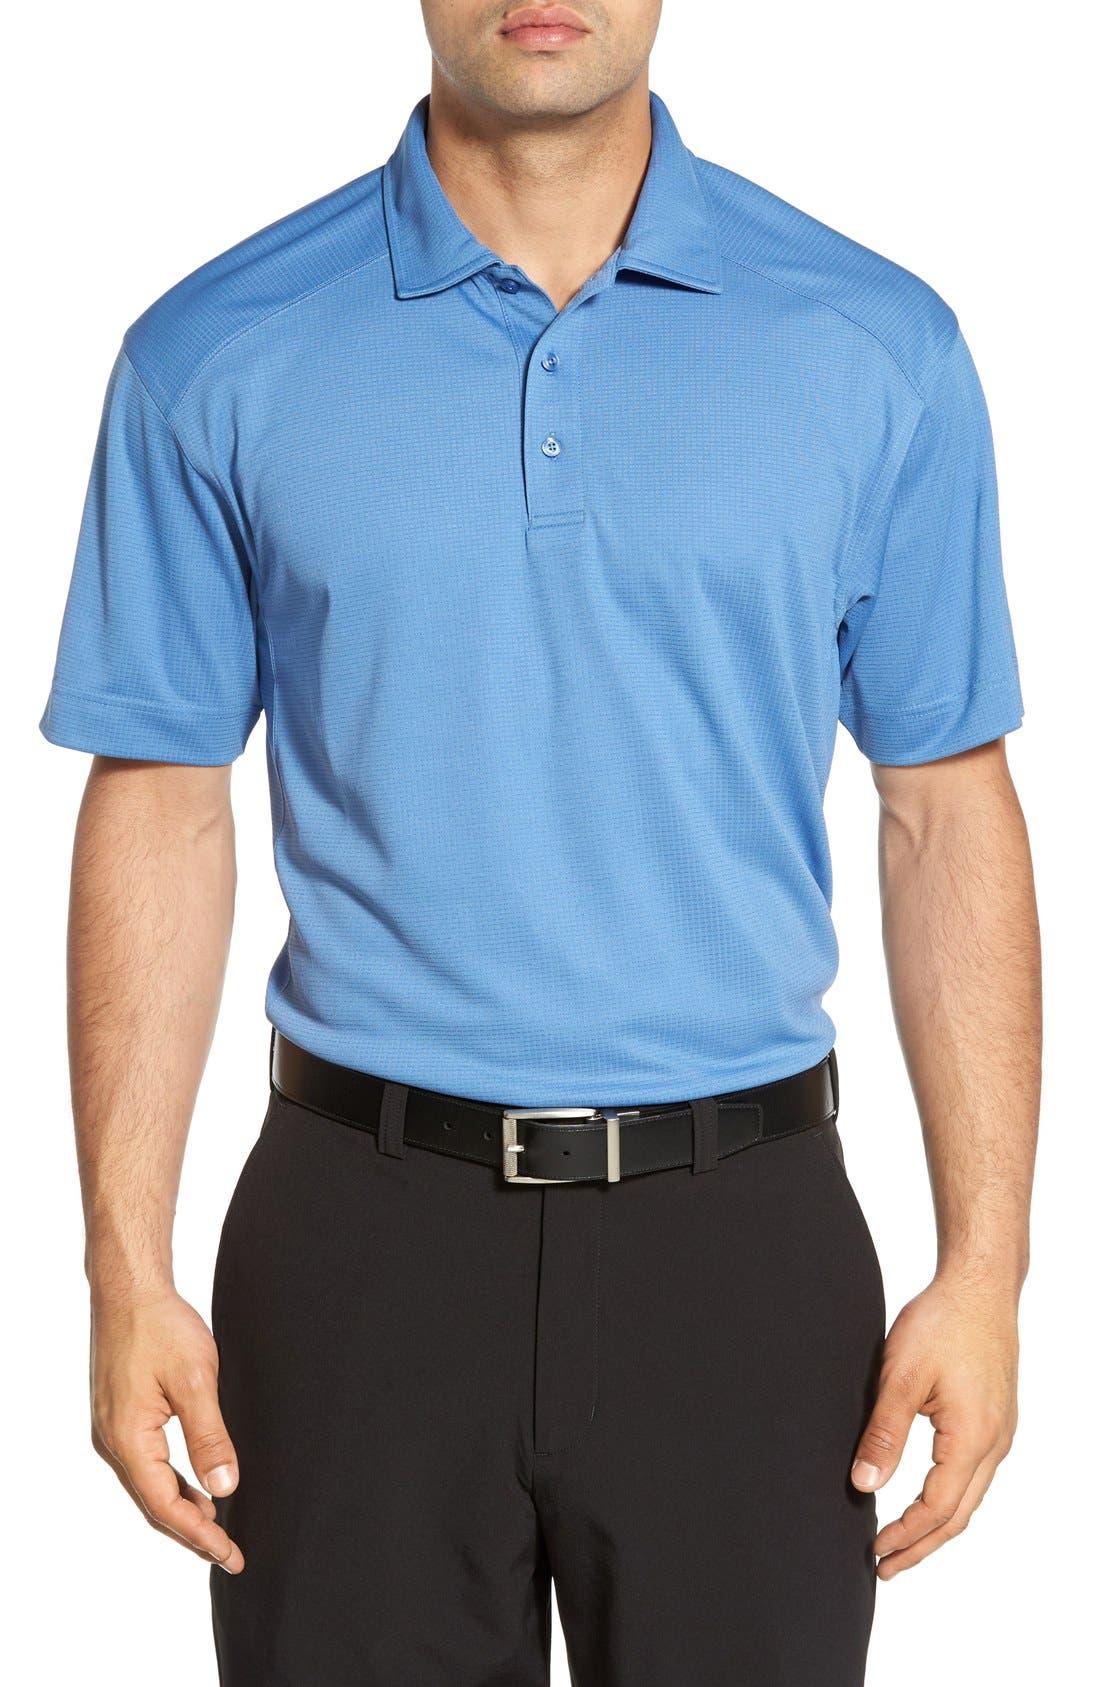 'Genre' DryTec Moisture Wicking Polo,                             Main thumbnail 1, color,                             SEA BLUE